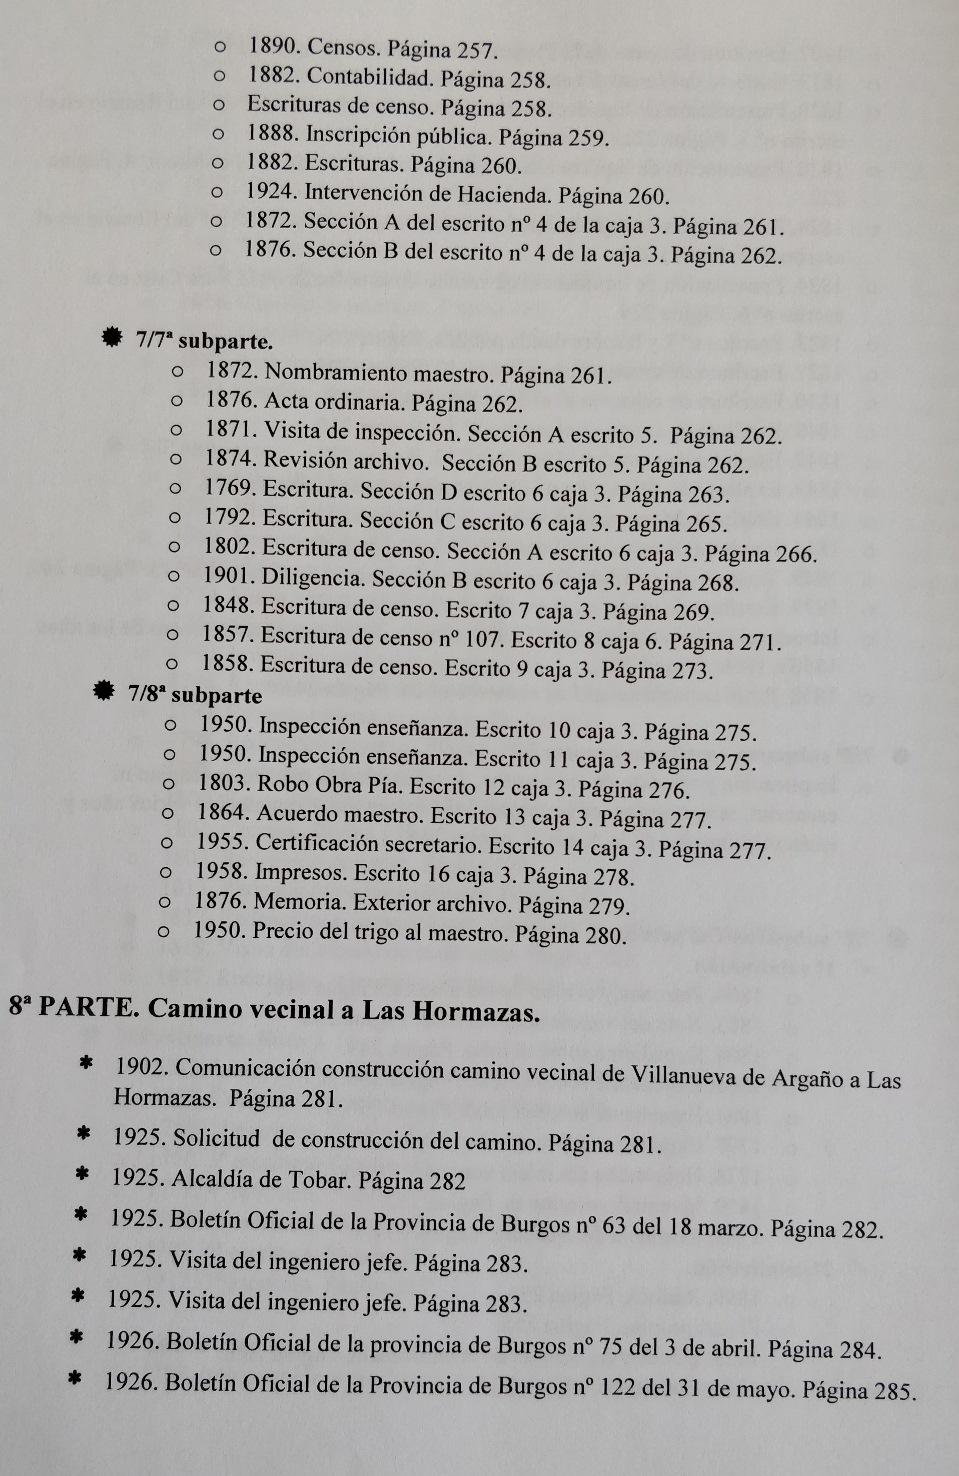 Libros-Alberto-10.jpg